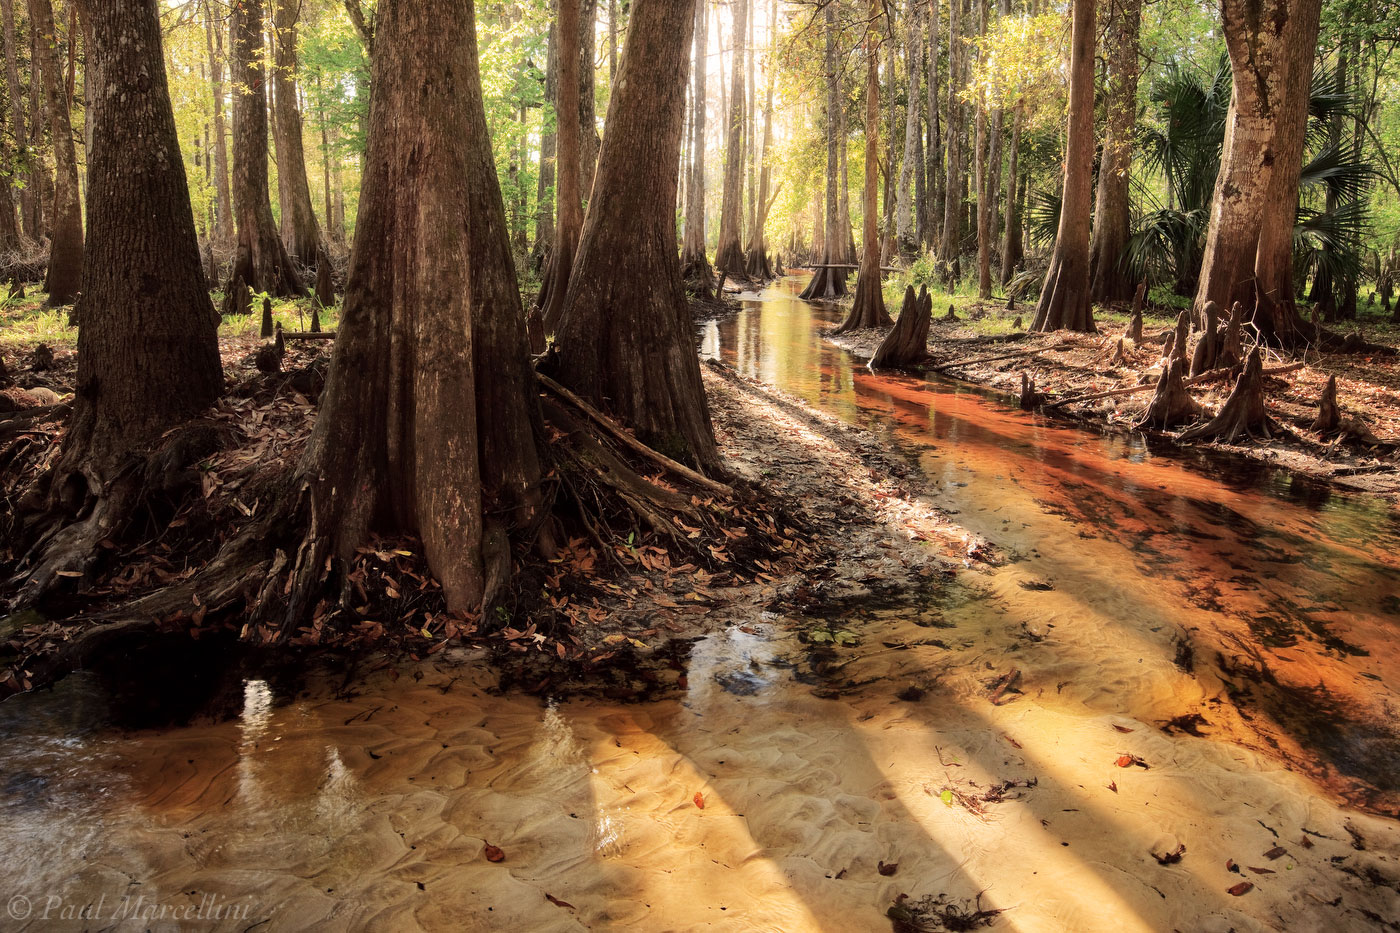 fisheating, creek, tannin, fisheating creek, Fisheating Creek Wildlife Management Area, florida, south florida, nature, photography, , photo